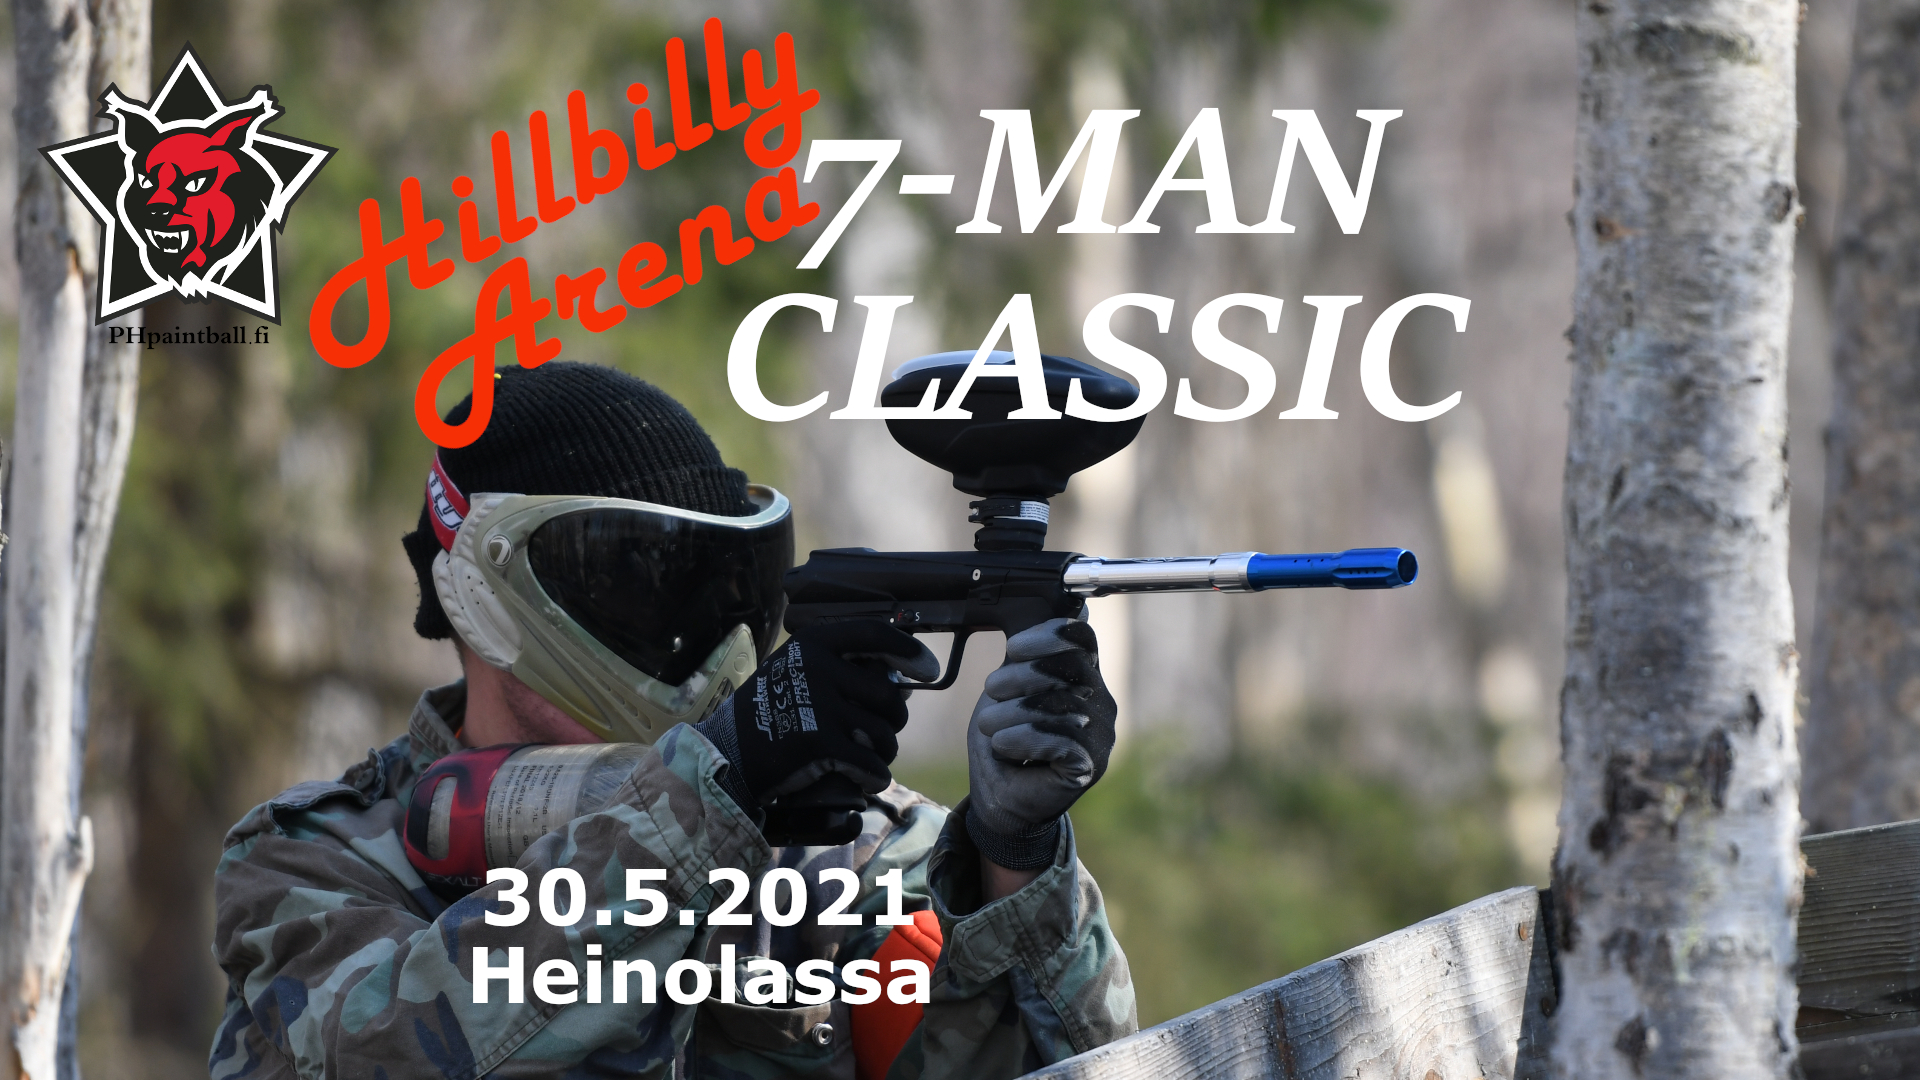 7manclassic2021.jpg